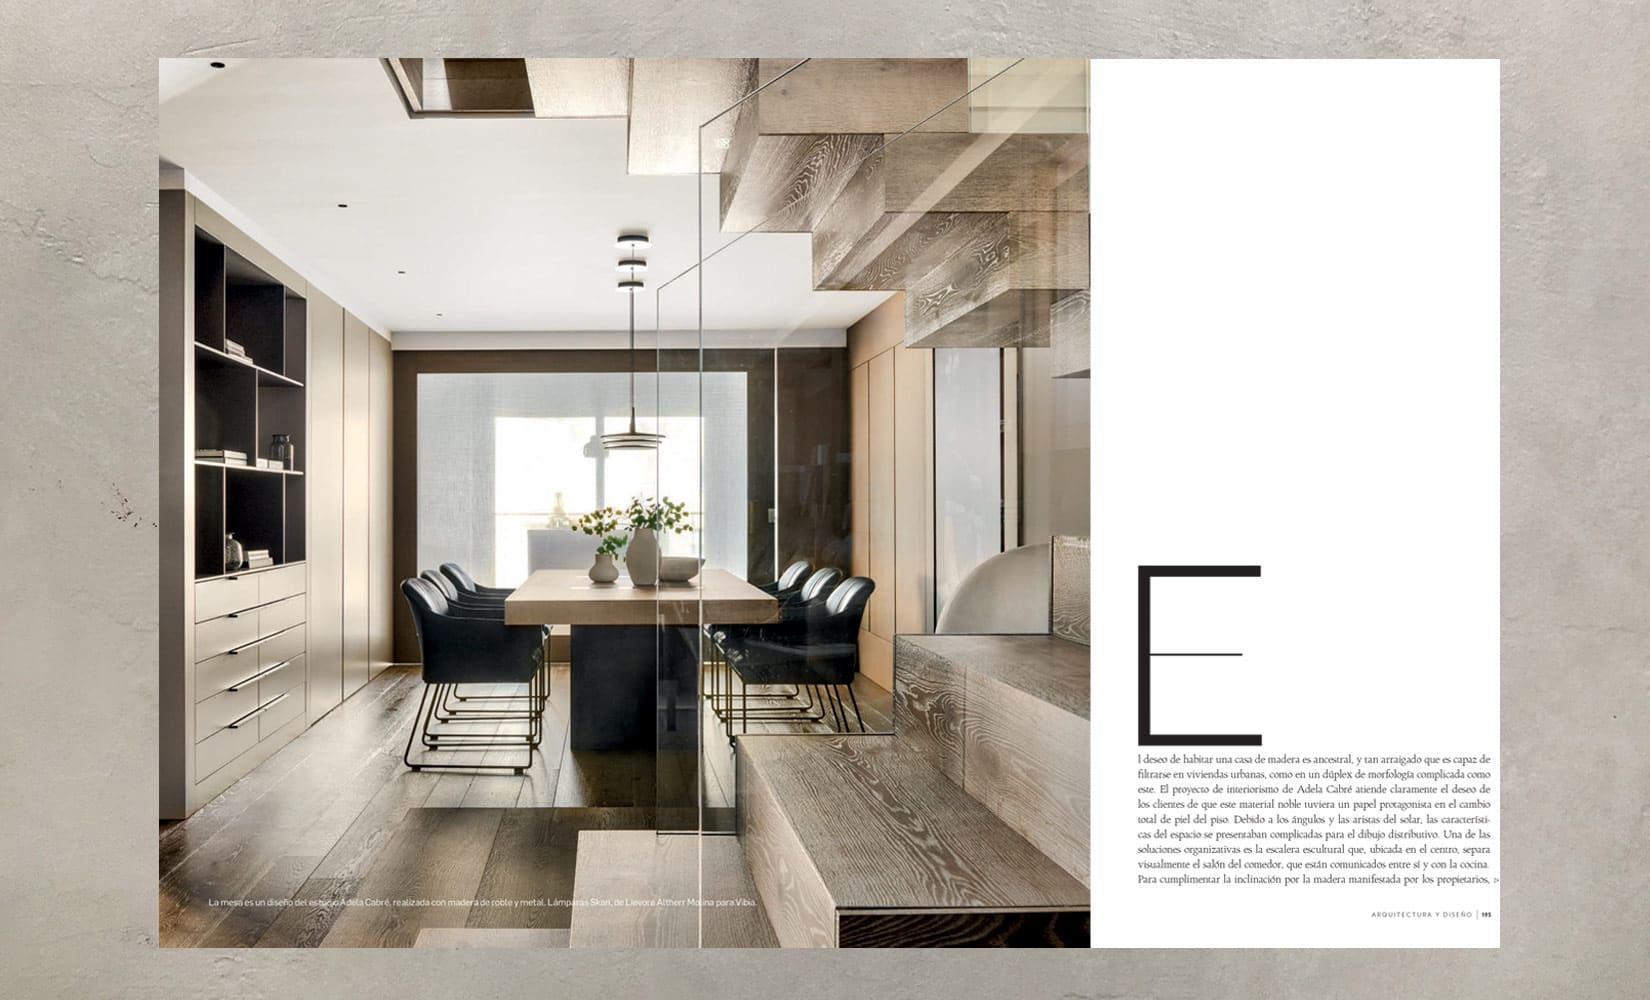 https://www.adelacabre.com/wp-content/uploads/2020/12/arquitectura-y-diseno-junio-2019-03.jpg